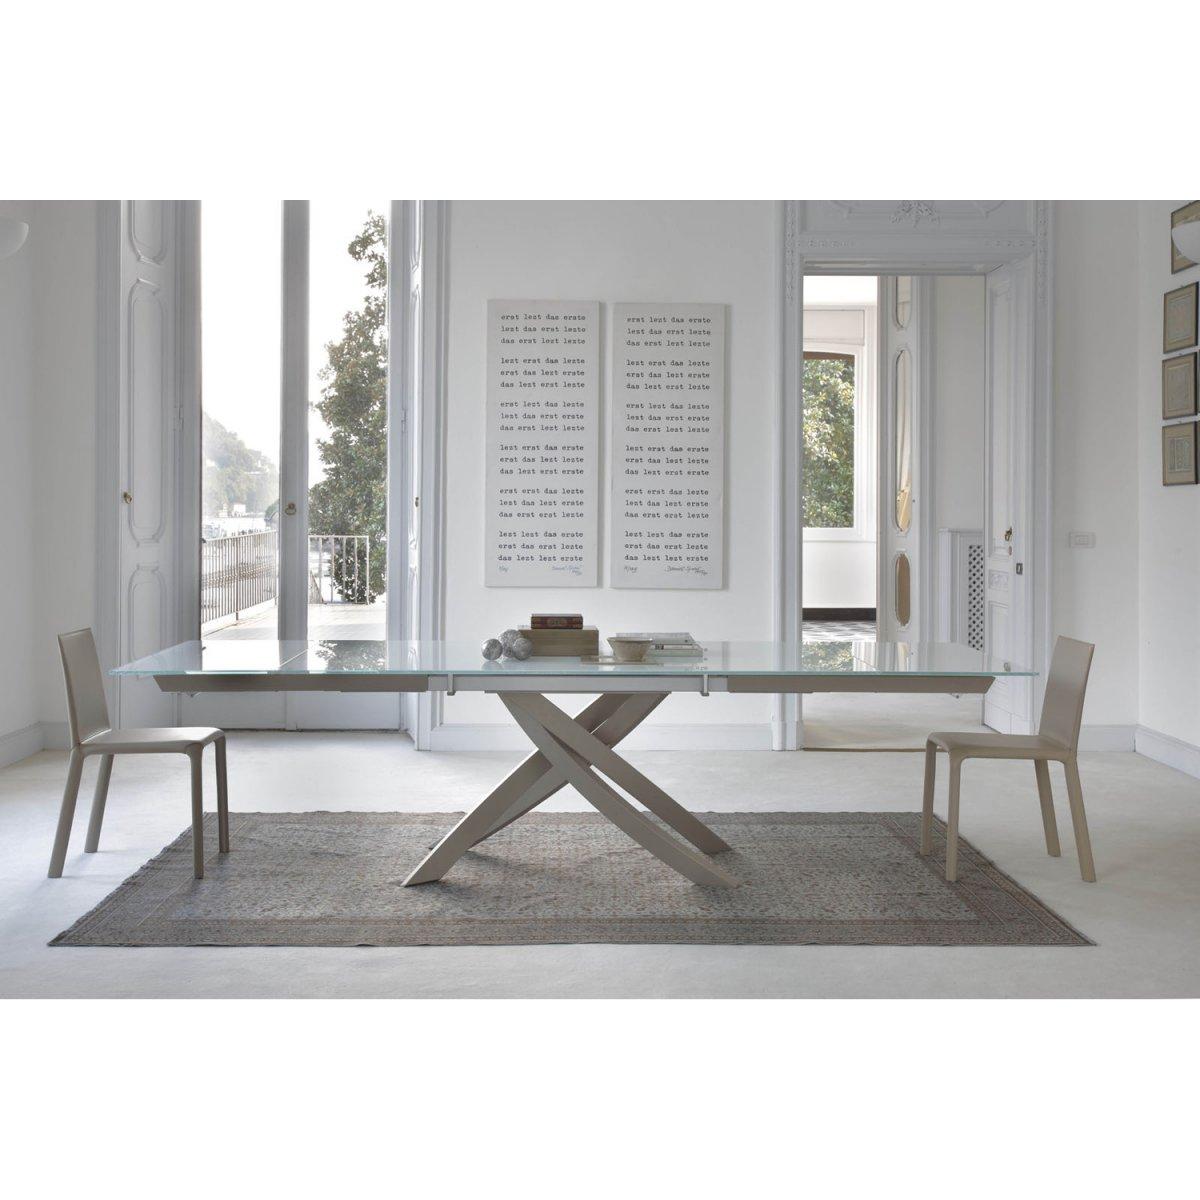 Bontempi Casa ARTISTICO Ausziehbarer Tisch 190X106 KRISTALLGLAS/LACKIERT